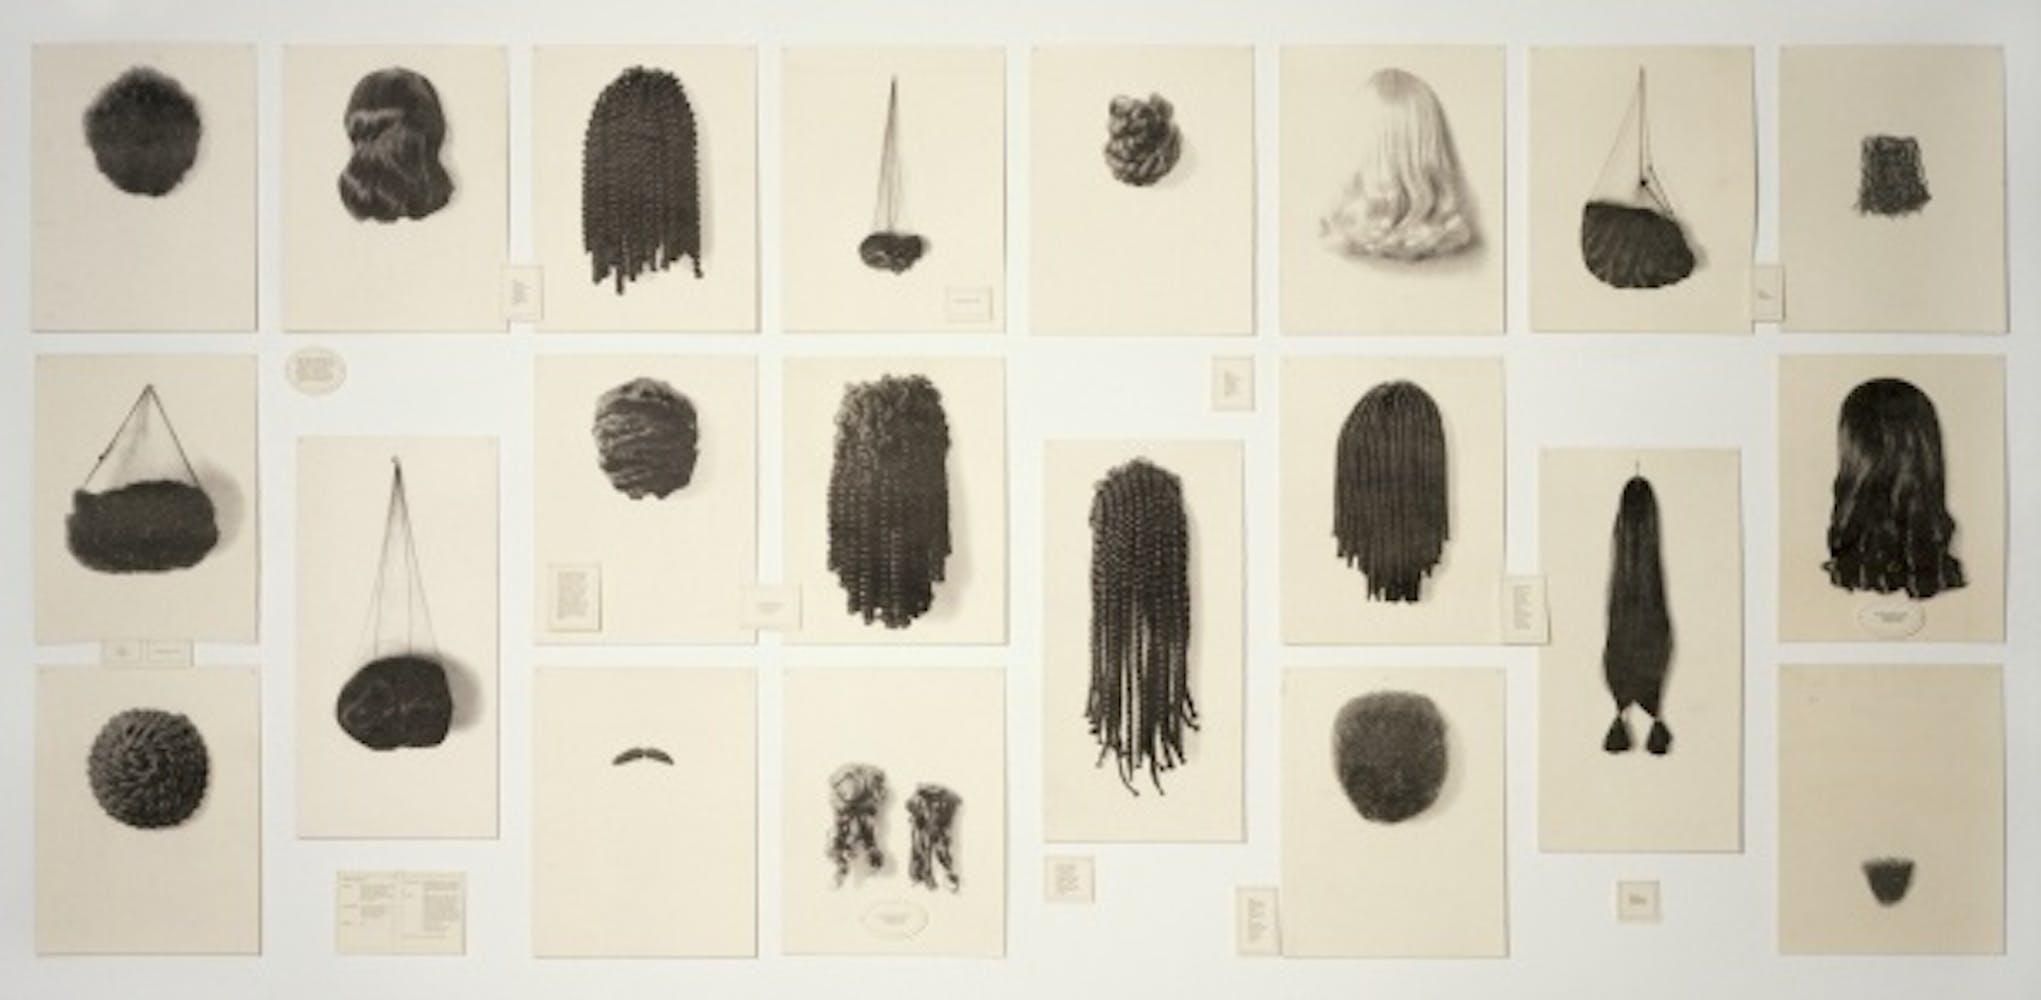 Lorna Simpson, Wigs (portfolio), 1994